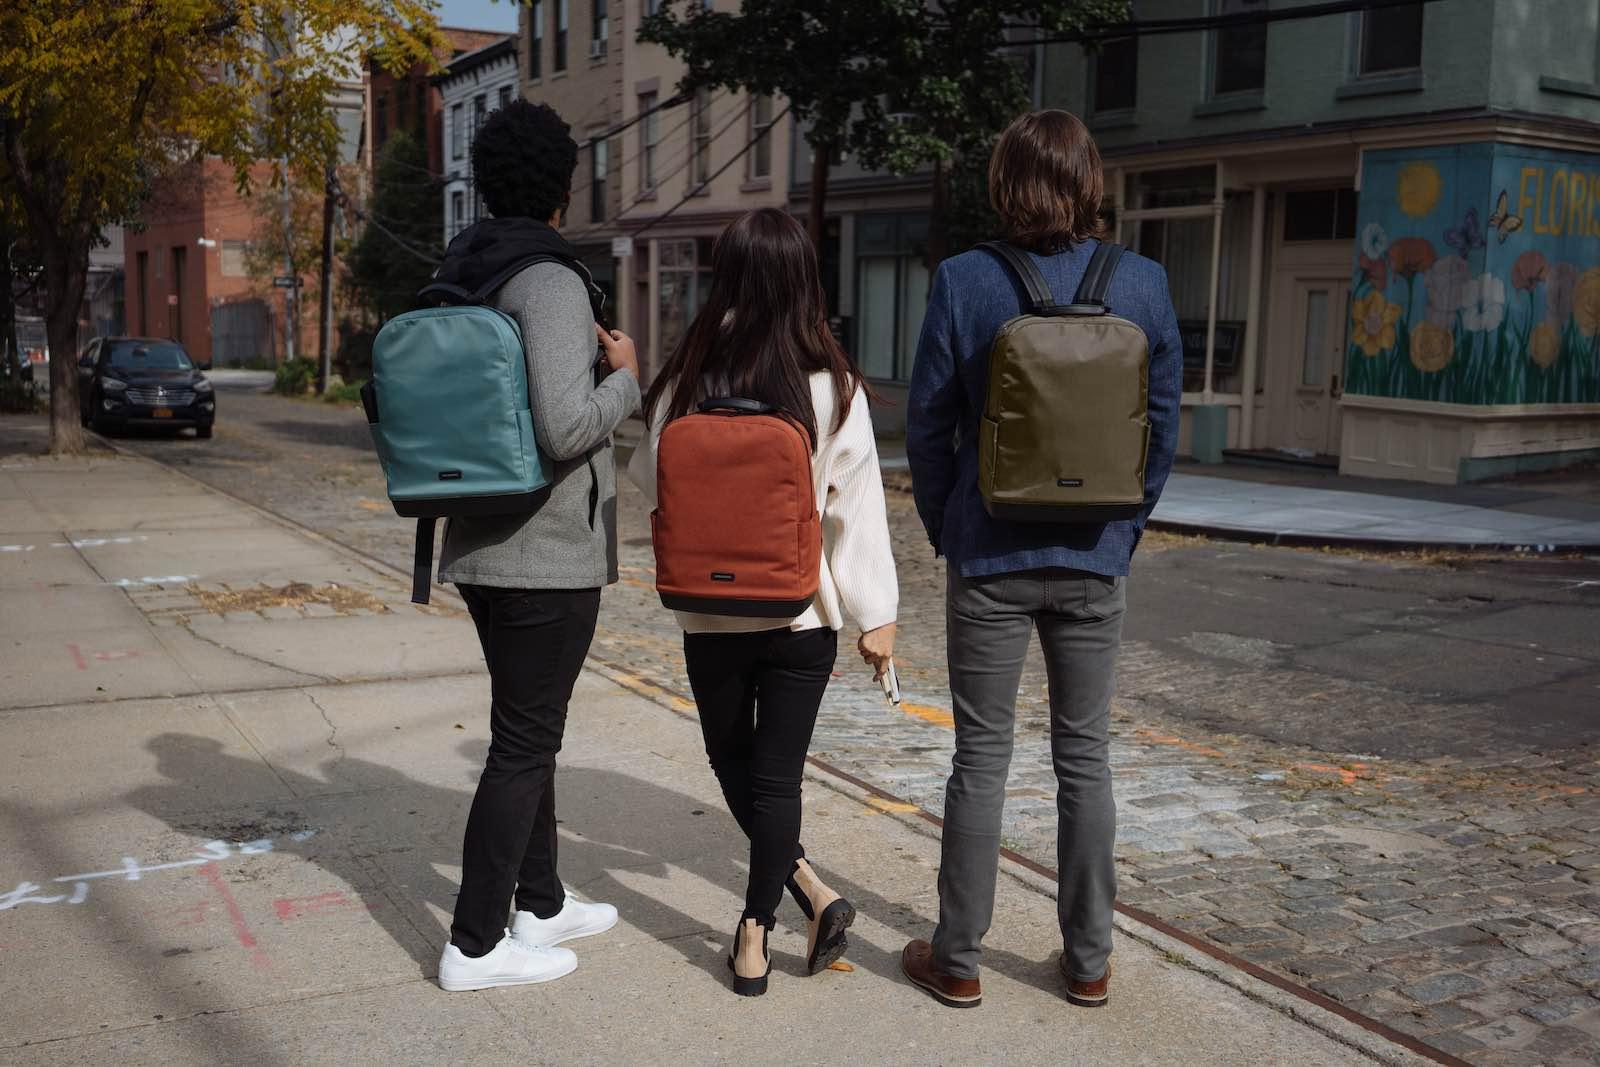 Den Moleskine Rucksack gibt es in verschiedenen Varianten